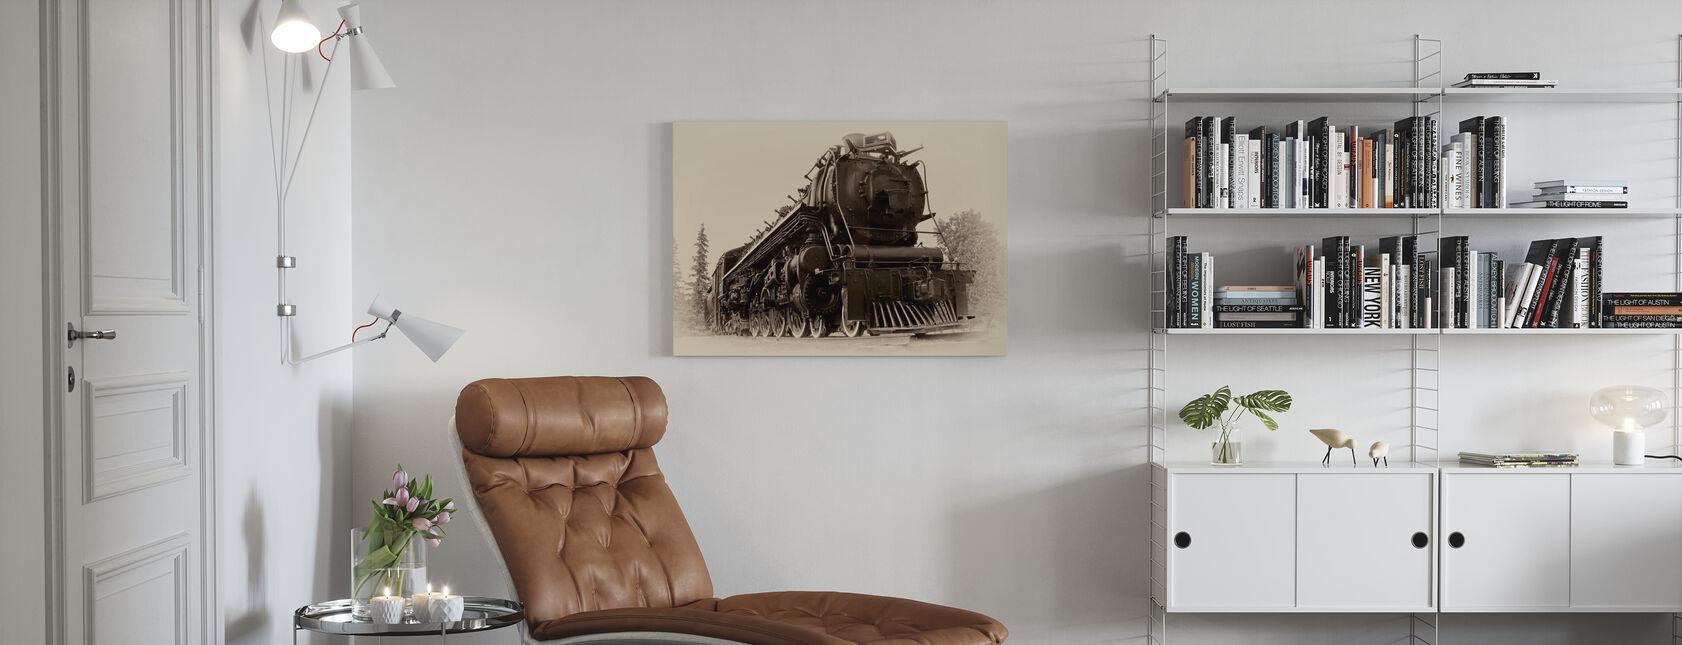 Stoomlocomotief - Canvas print - Woonkamer